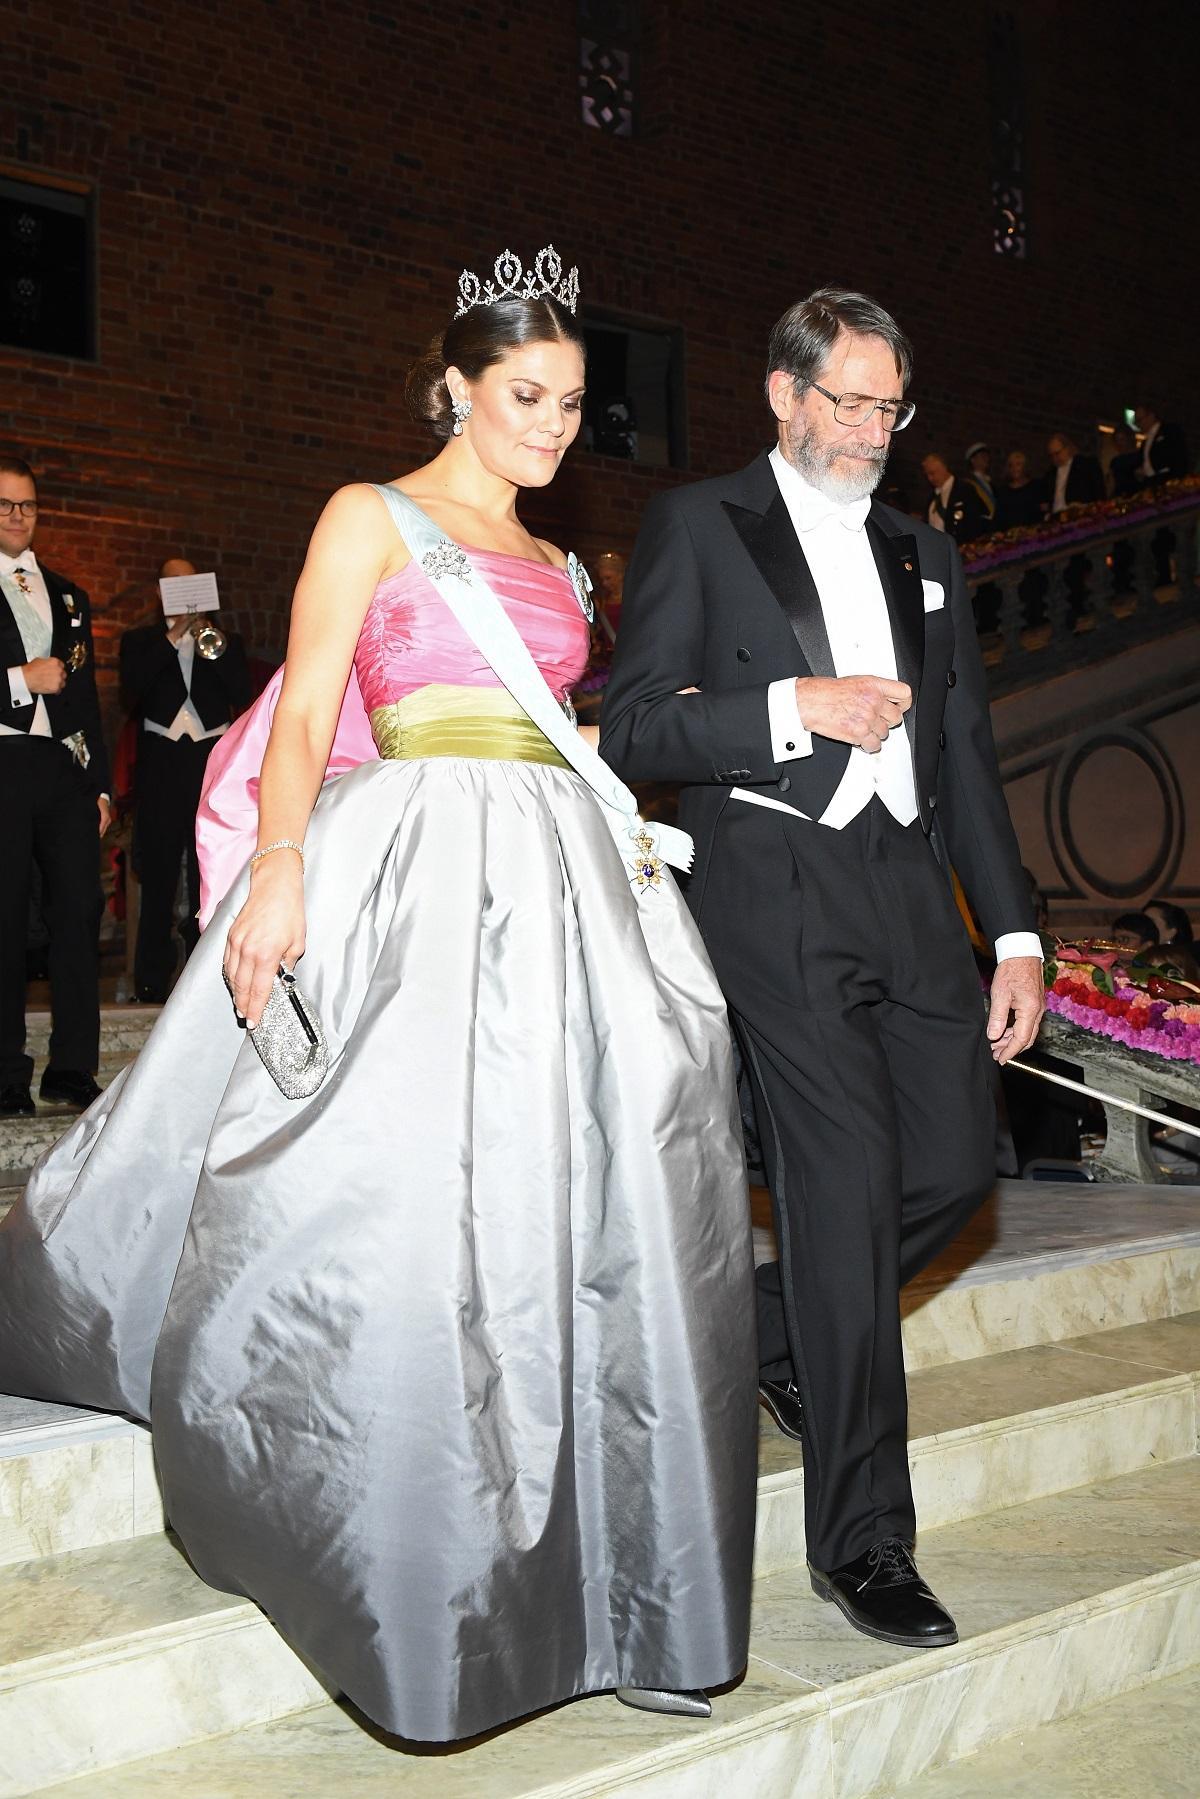 Vingt Trois Ans Apres La Princesse Victoria De Suede Porte Une Robe De Bal Ayant Appartenu A Sa Mere Madame Figaro